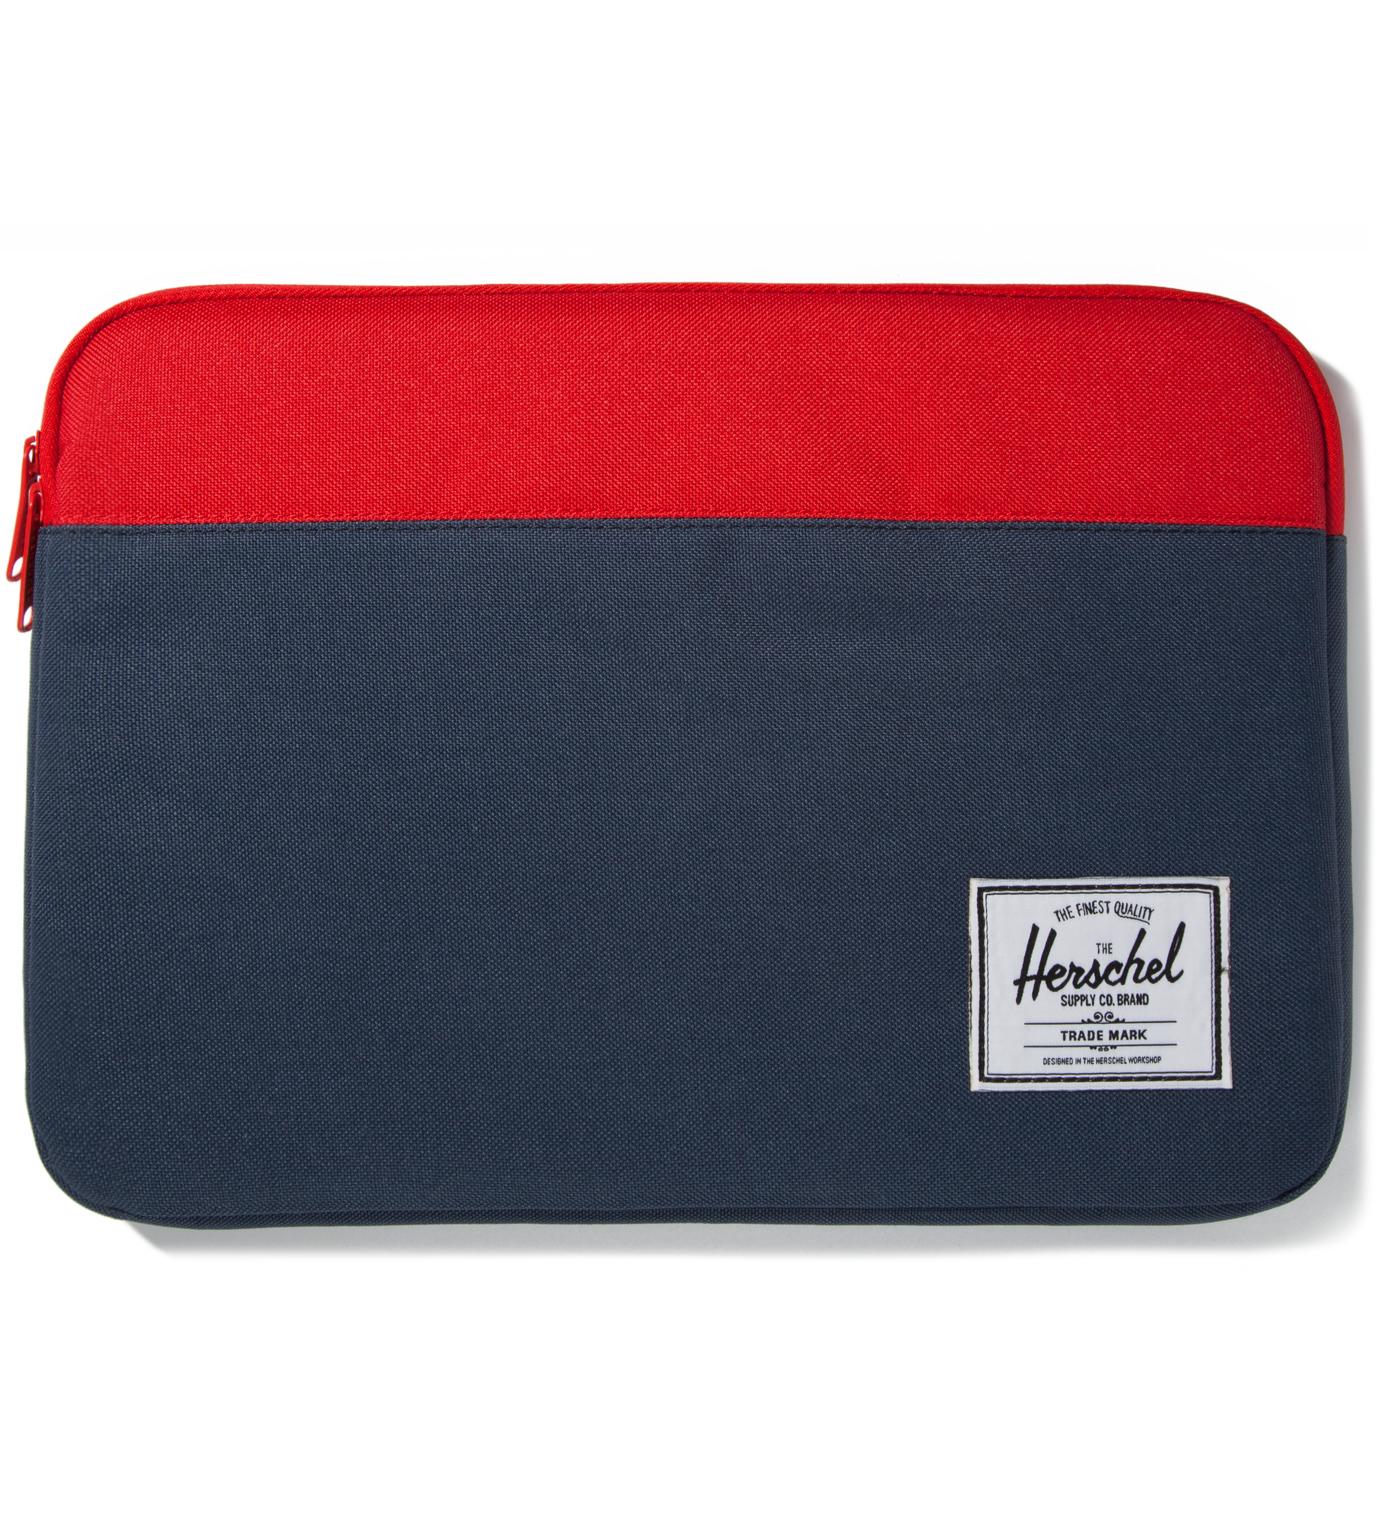 "Herschel Supply Co. Red/Navy Anchor Sleeve for 13"" Macbook Pro"